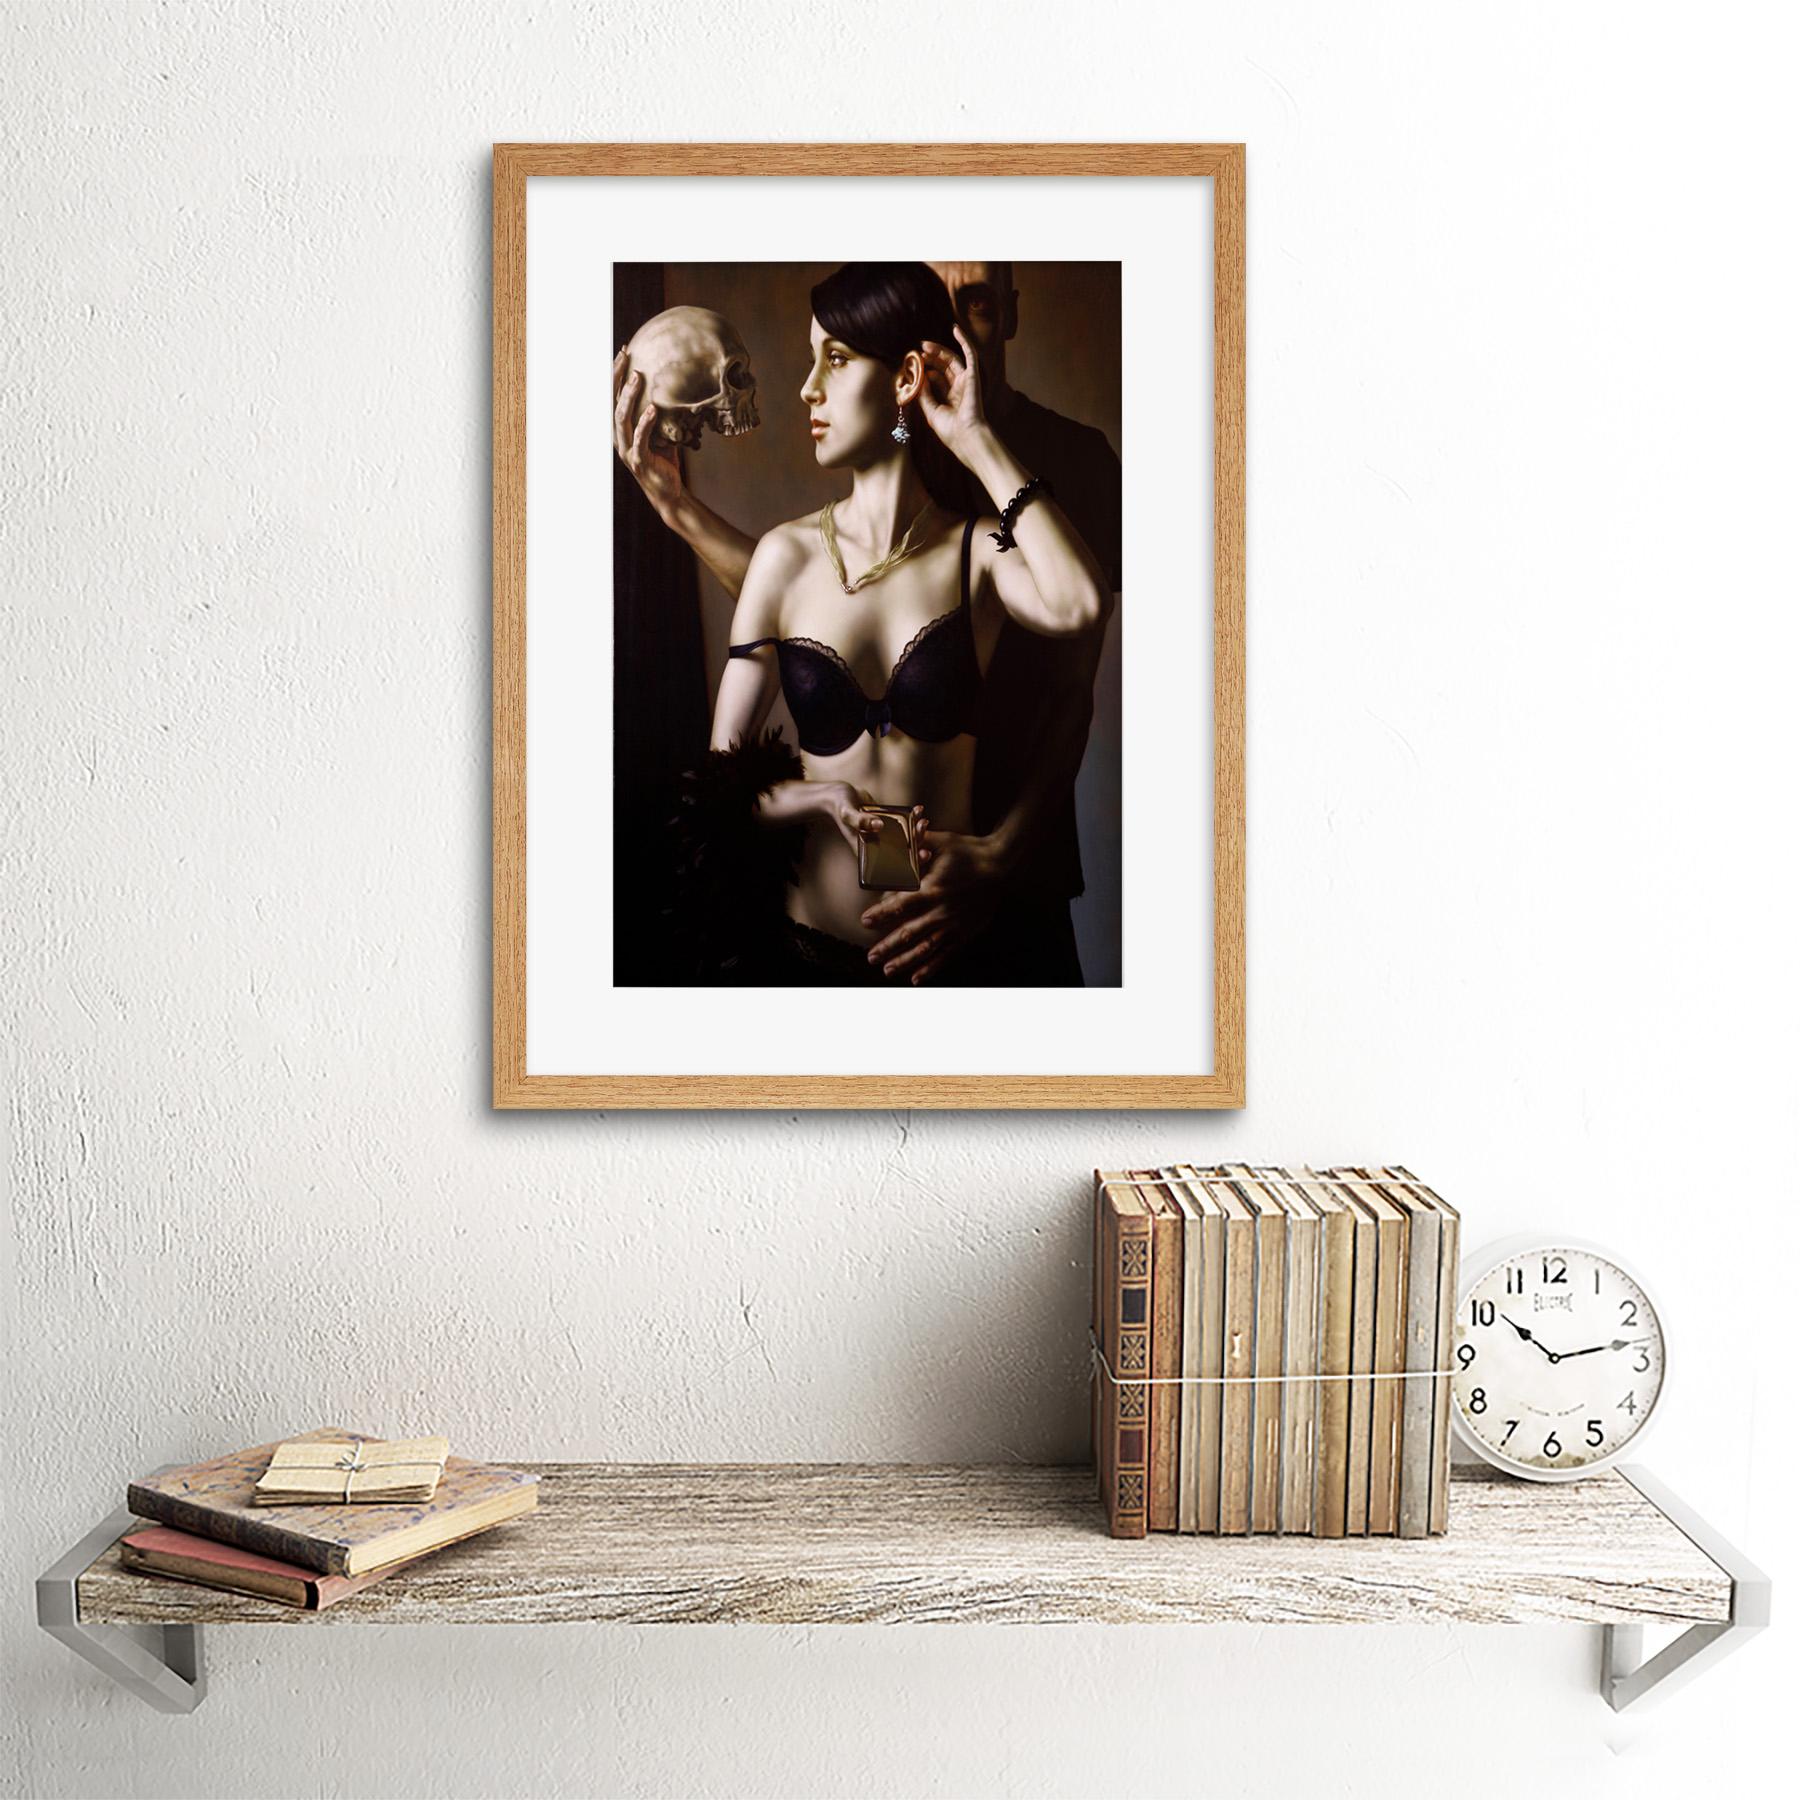 Painting-Balcar-Send-Me-To-The-Future-Framed-Art-Print-12x16-Inch 縮圖 13